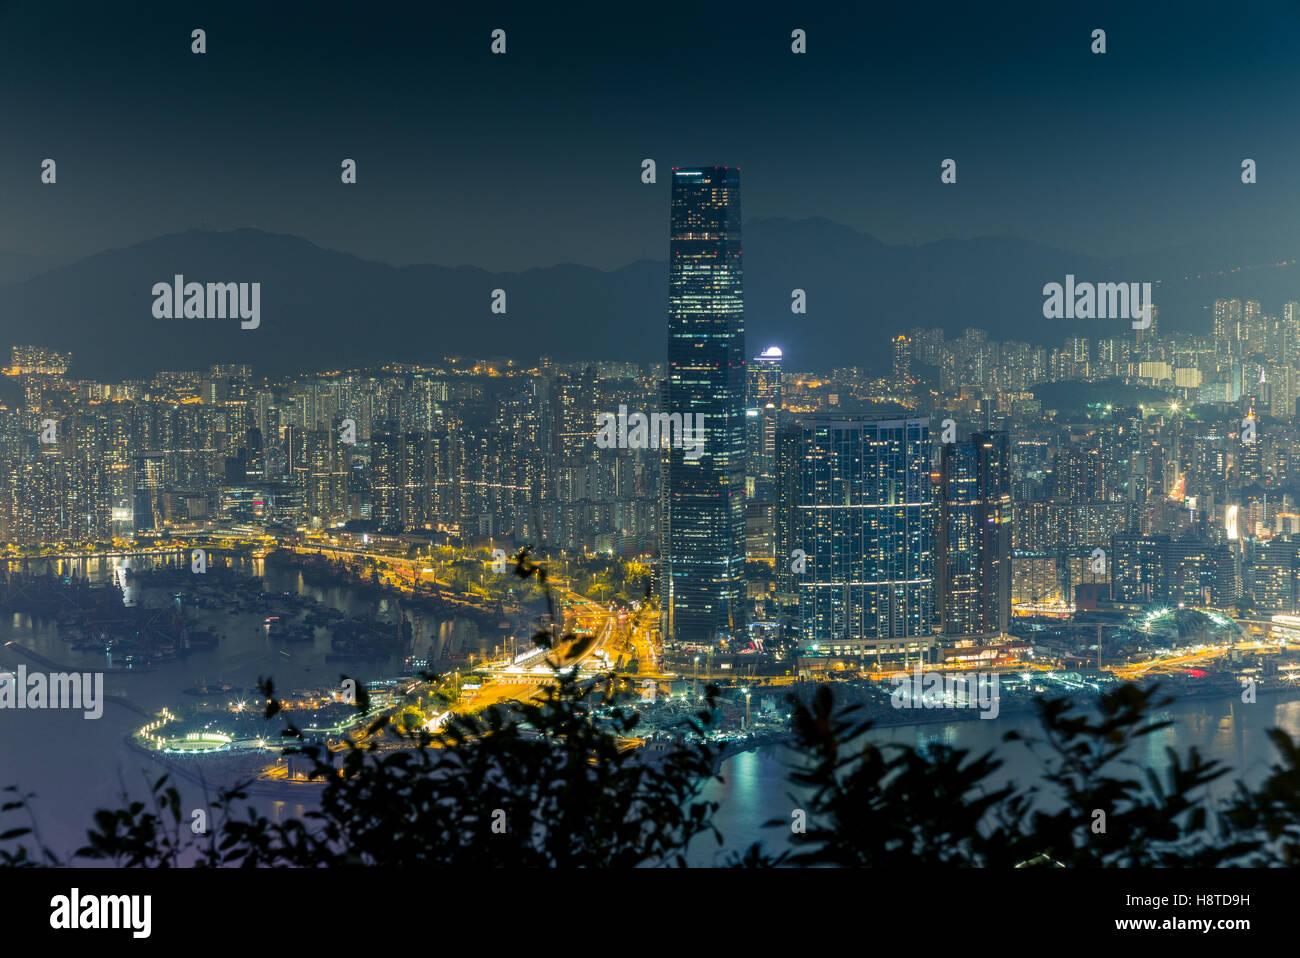 Lights and skyline of Central Hong Kong at night - 5 - Stock Image